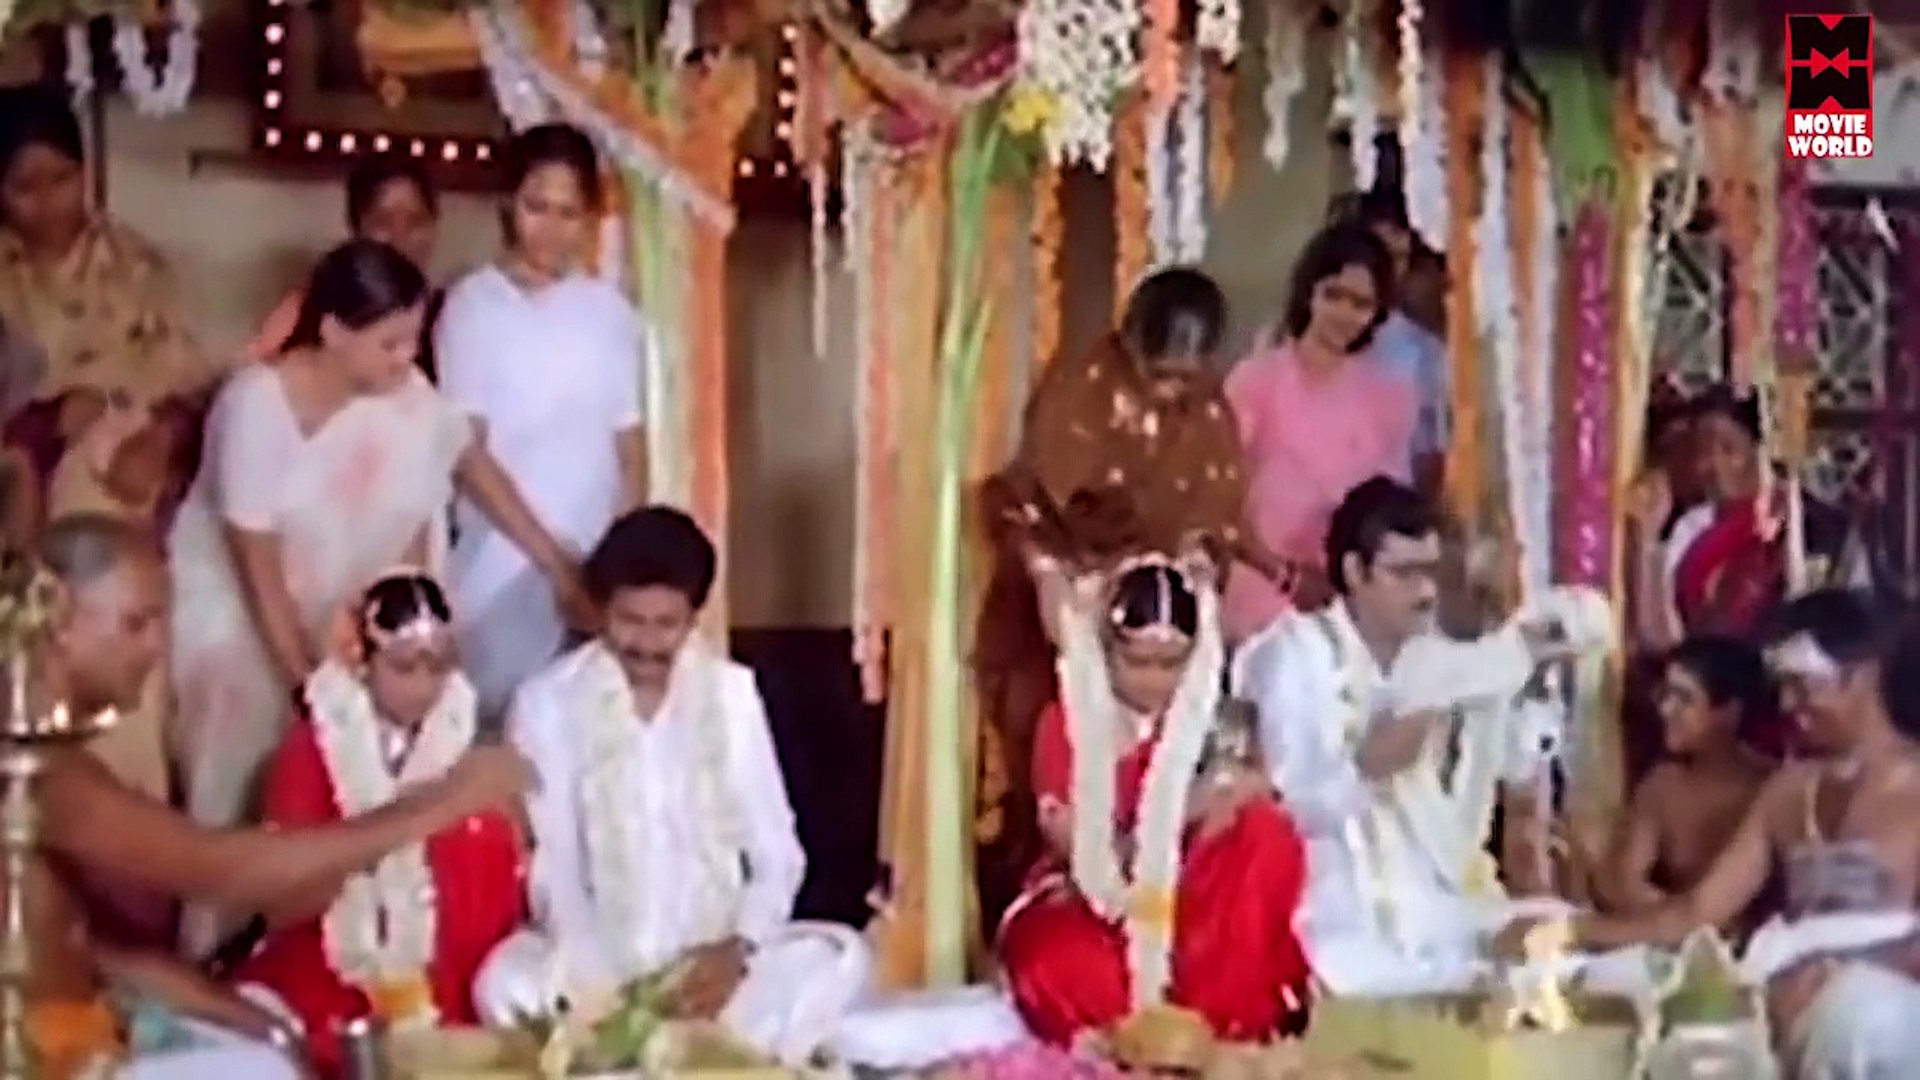 Tamil New Movies # Chinna Veedu # Latest Tamil Movies # Tamil Romantic Full Movies